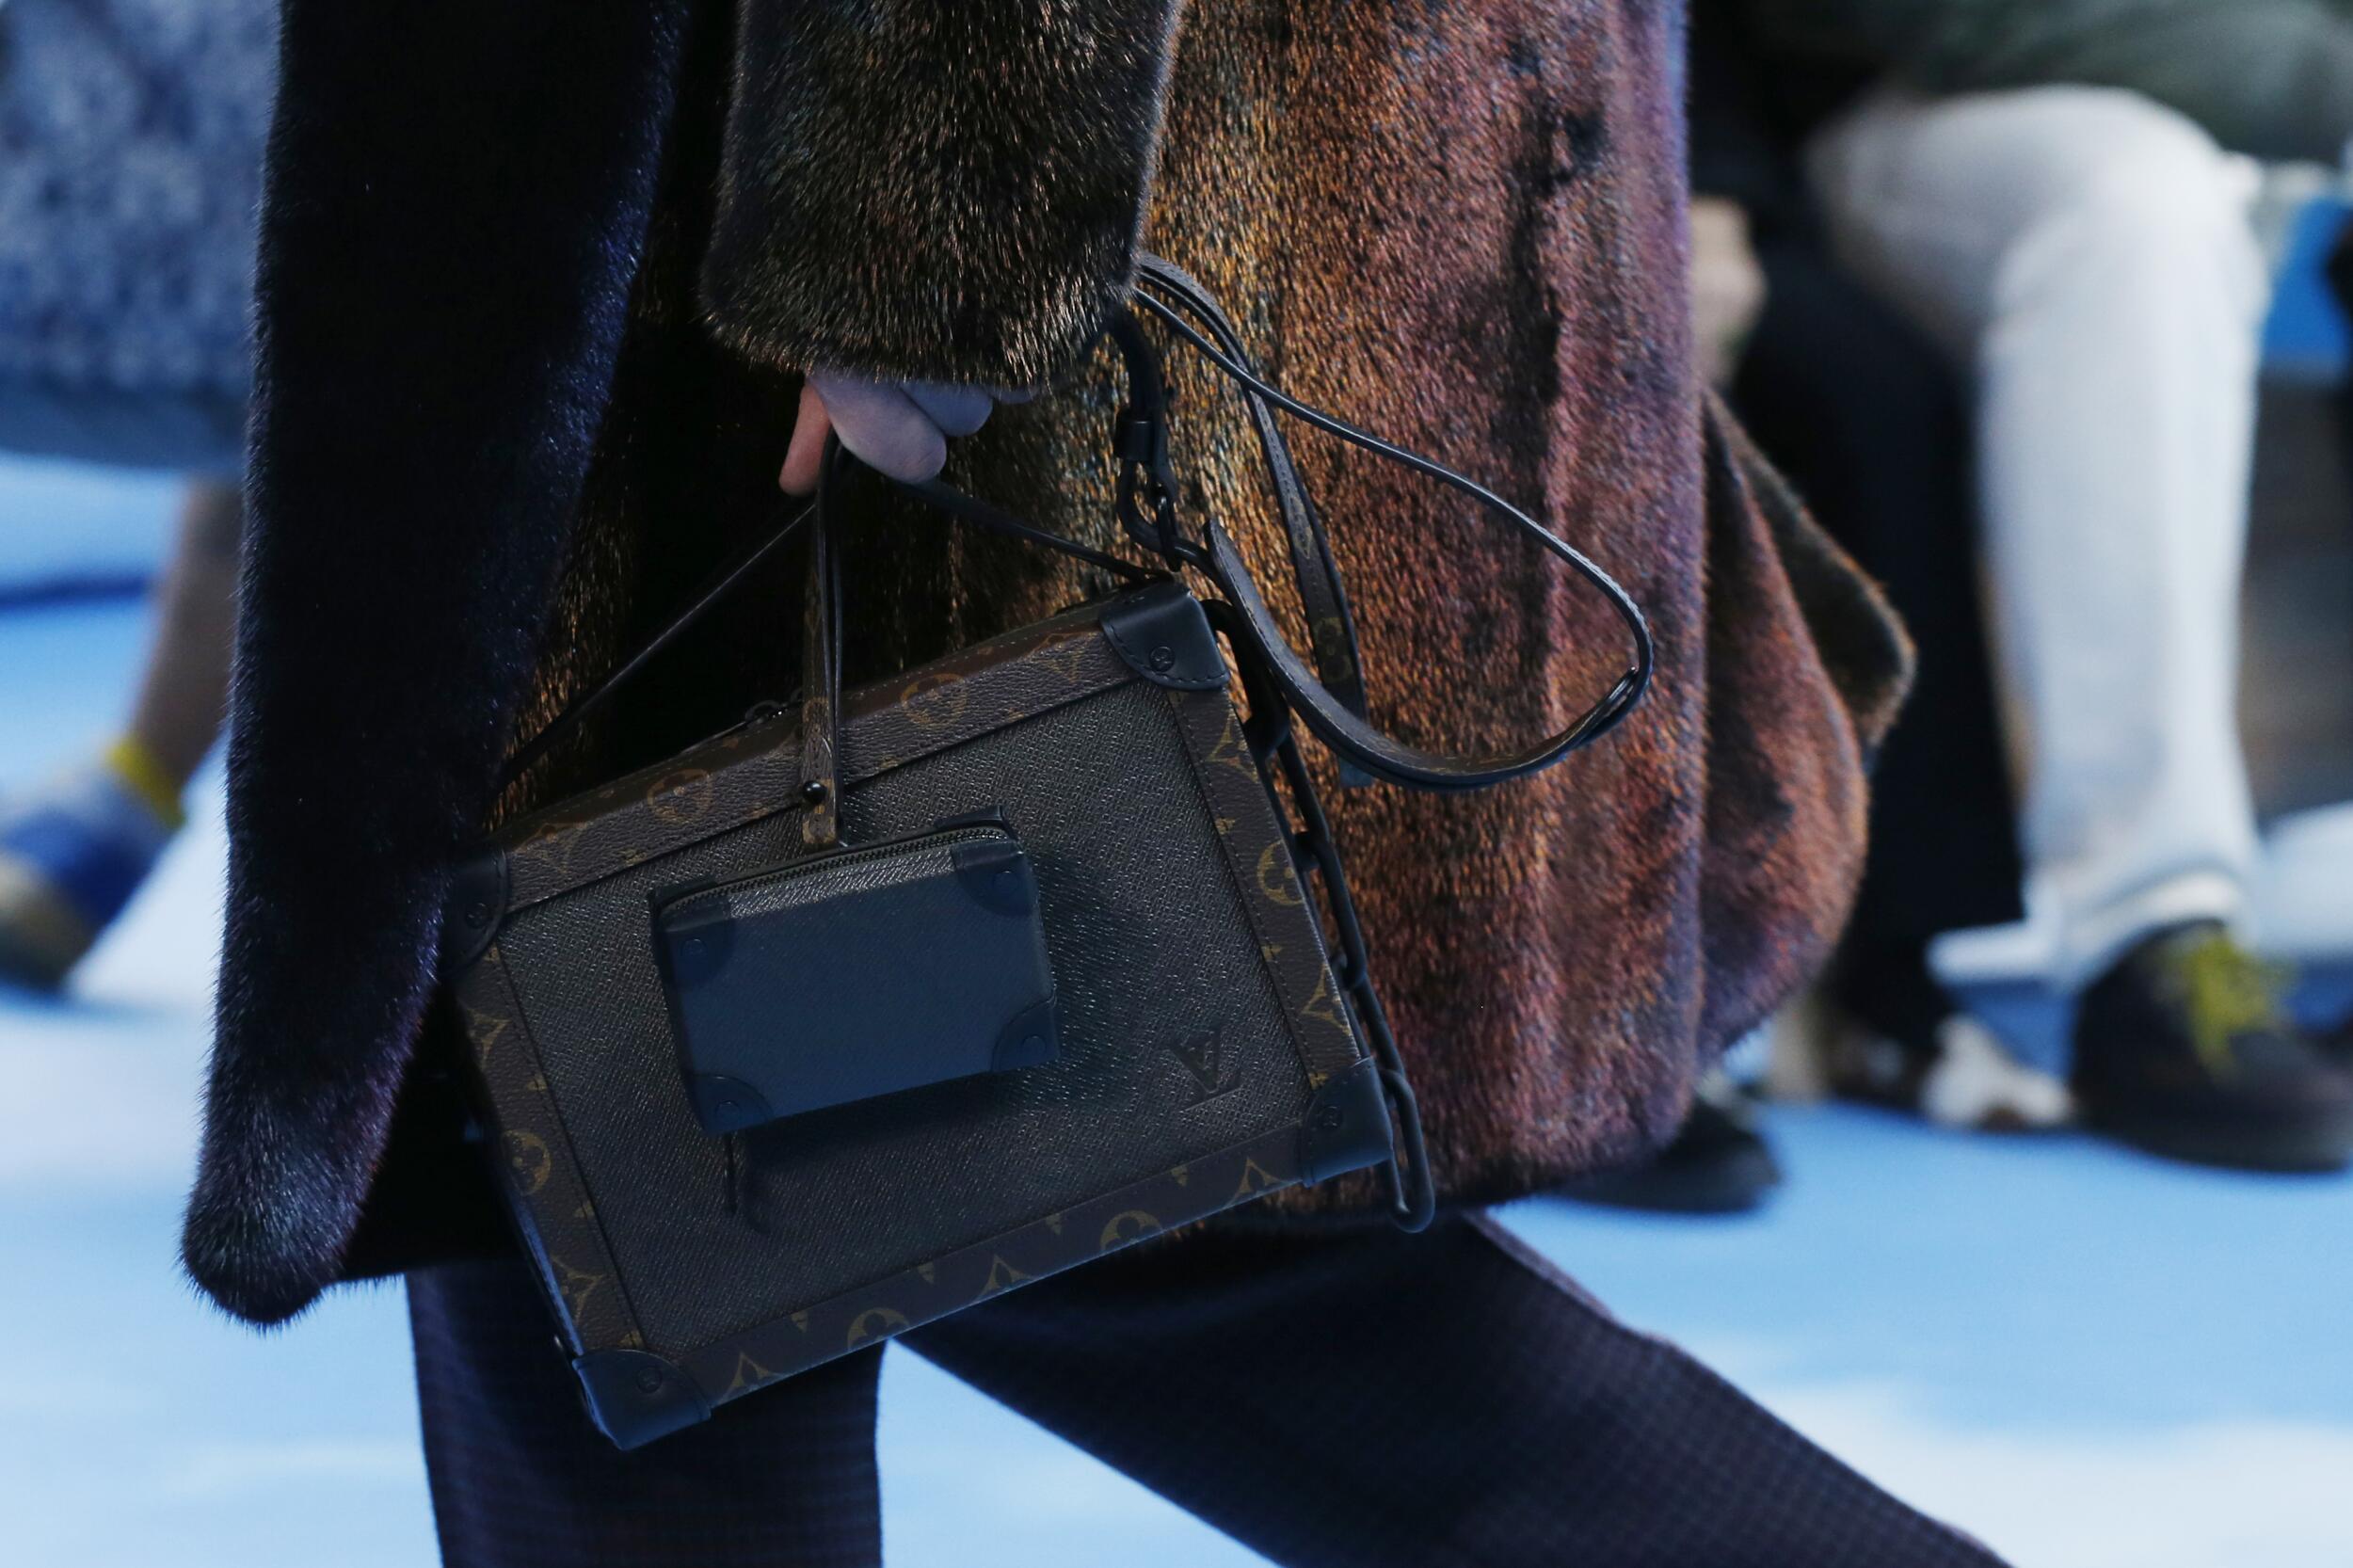 Louis Vuitton Handbag Menswear 2020-21